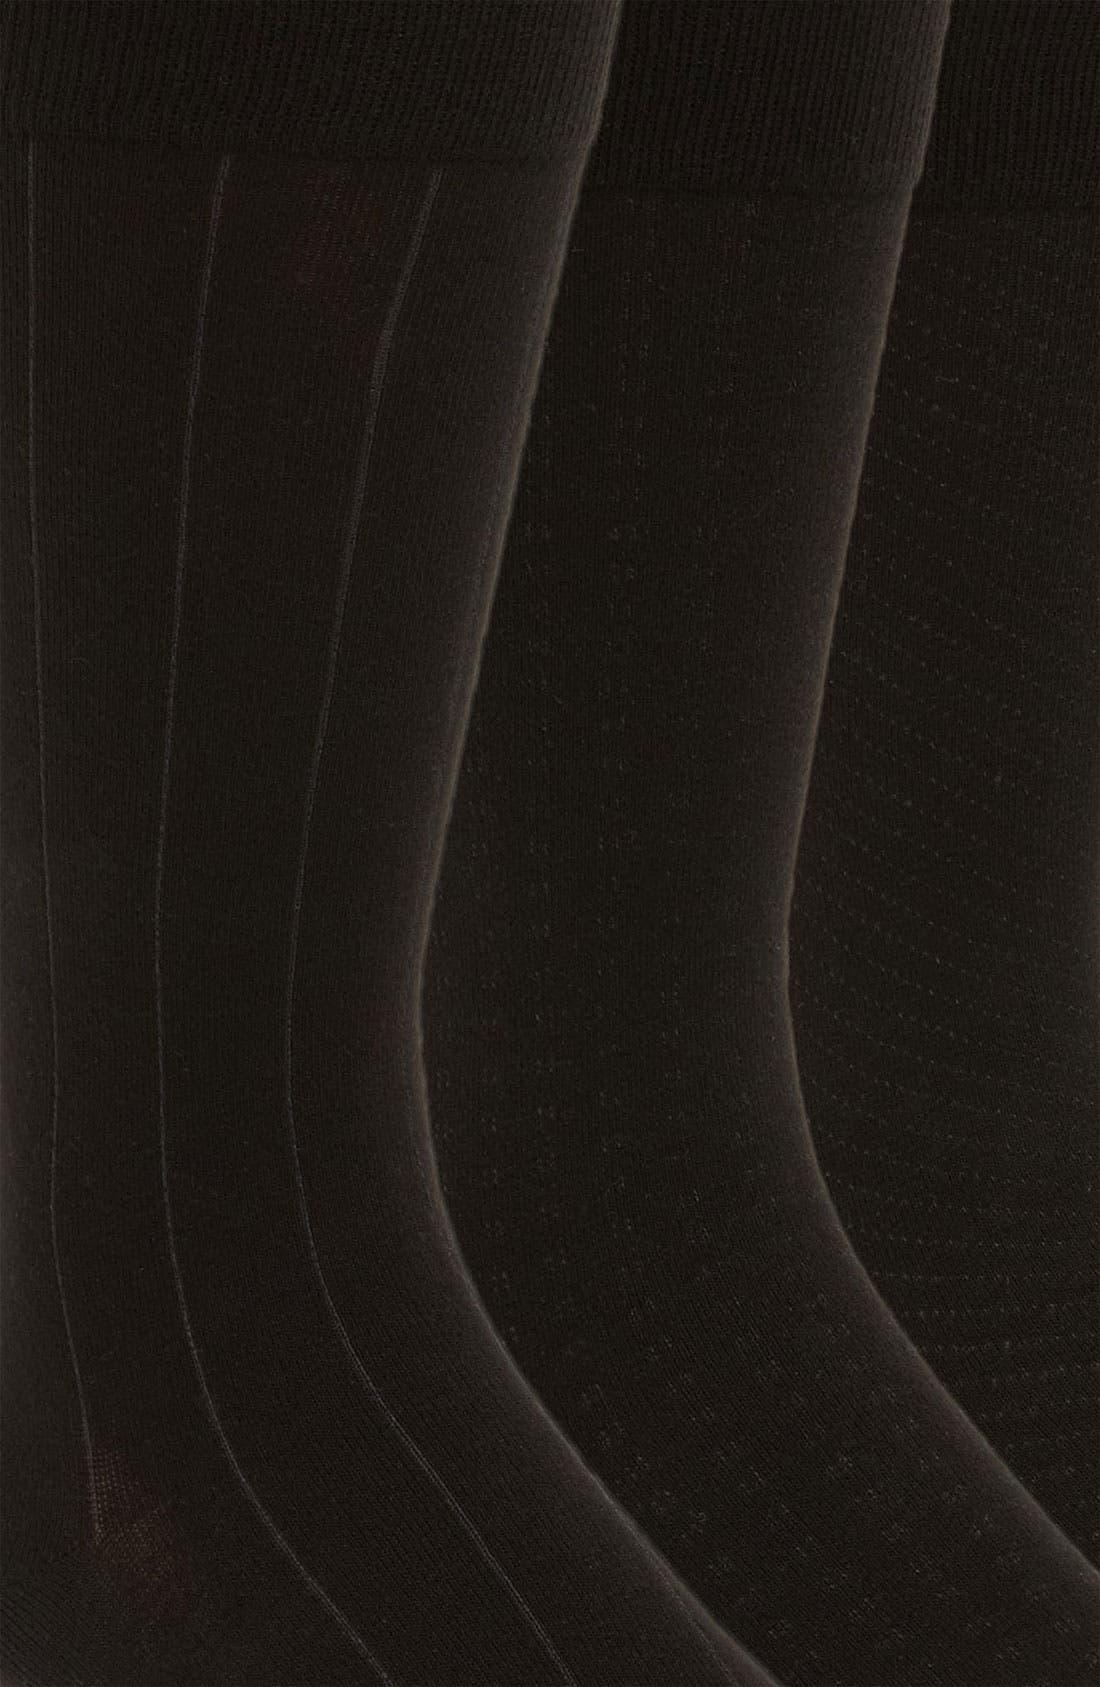 Dress Socks,                             Alternate thumbnail 2, color,                             BLACK